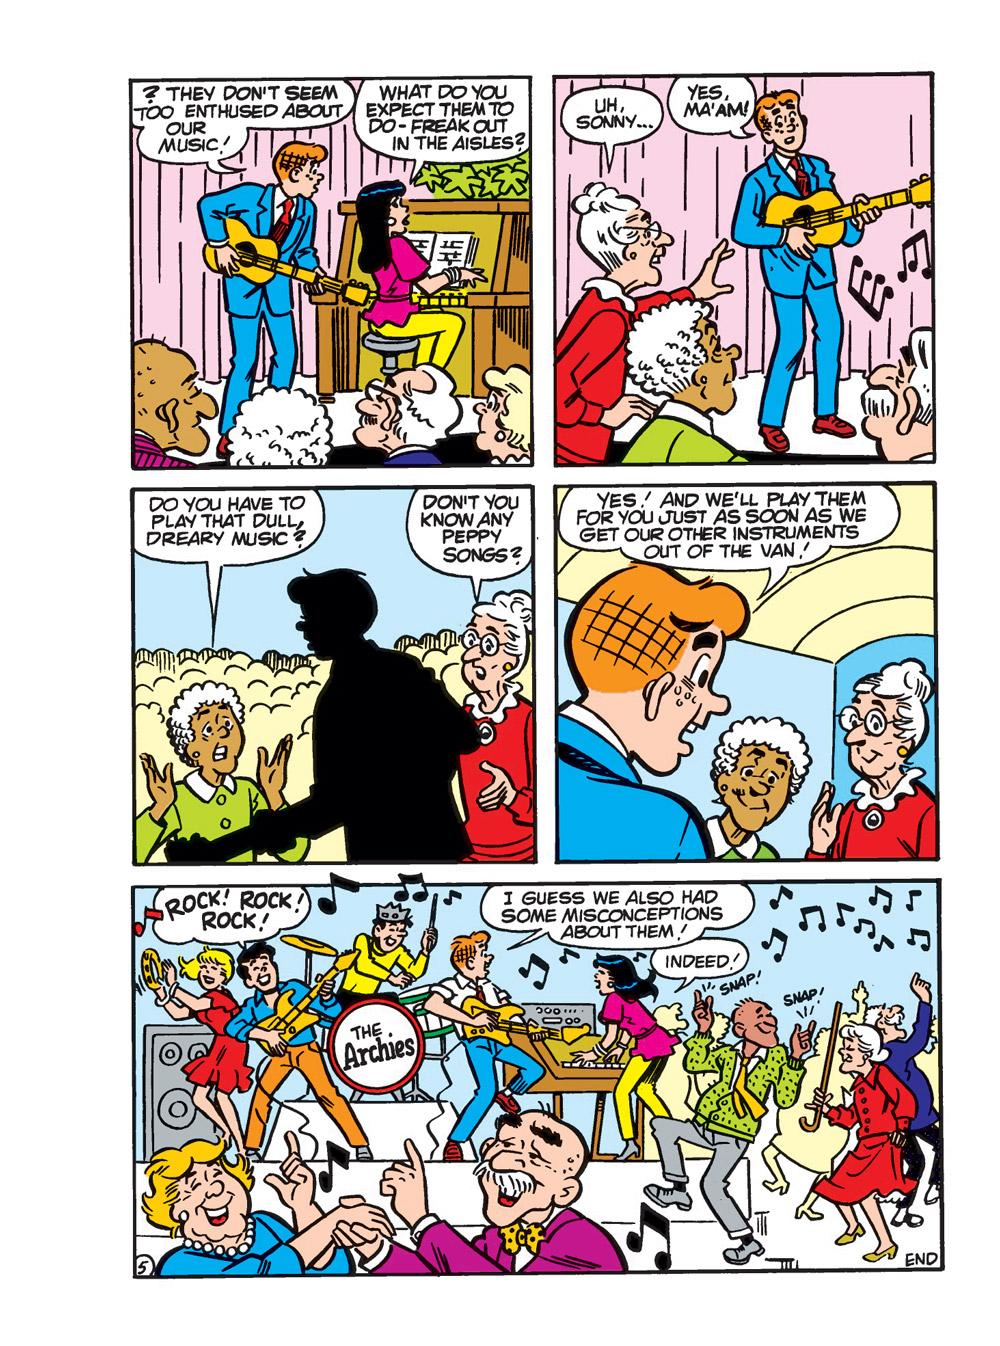 ArchieGiantComicsThrill-54 ComicList Previews: ARCHIE GIANT COMICS THRILL TP